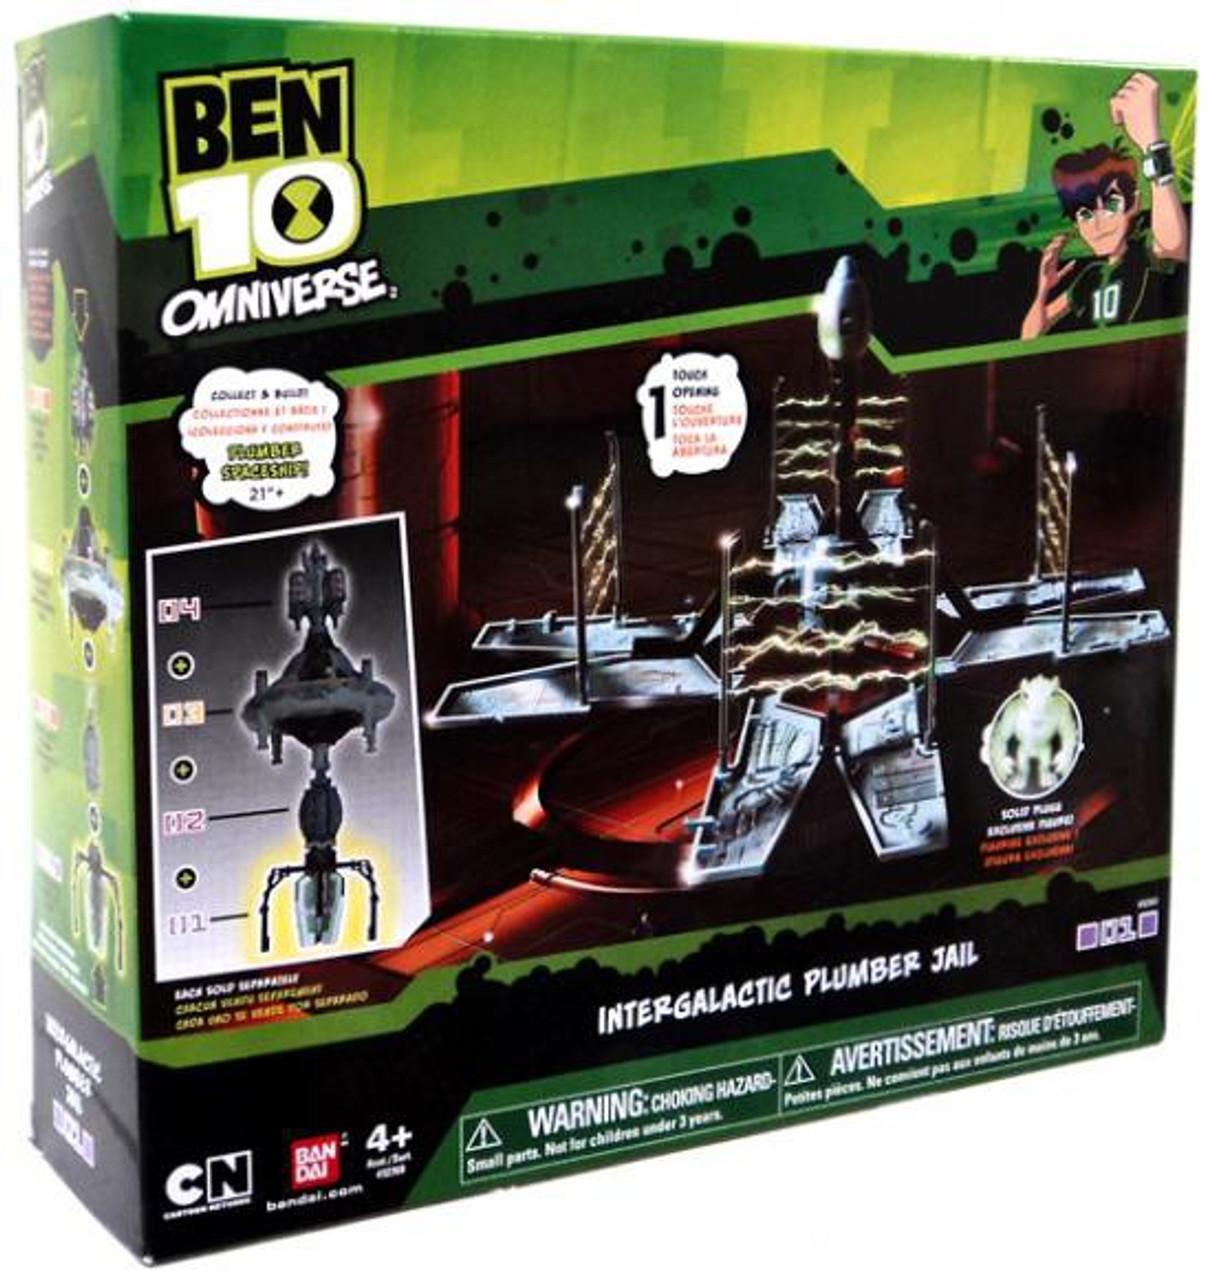 Ben 10 Omniverse Intergalactic Plumber Jail Playset